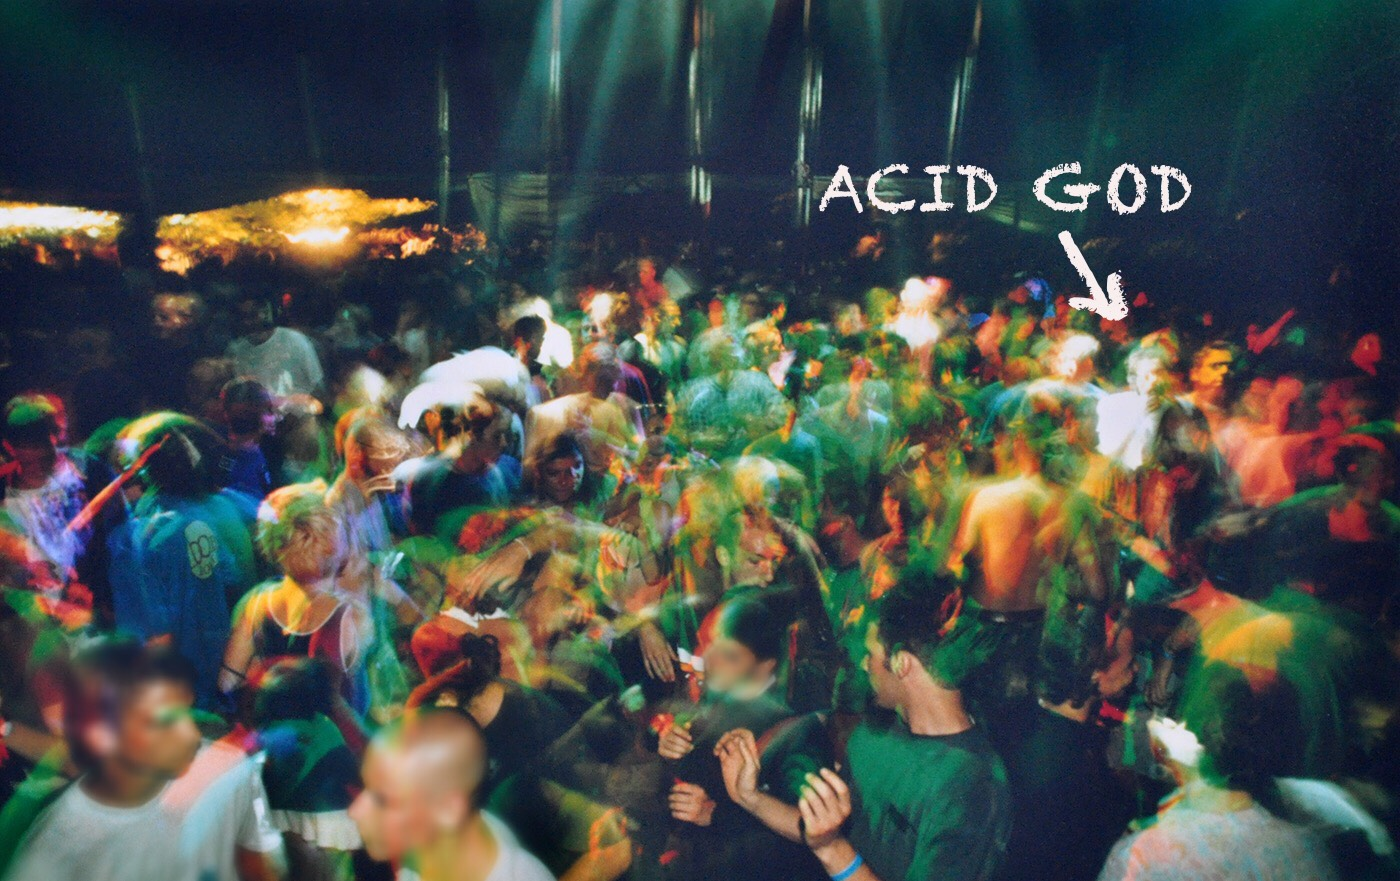 acidgod.jpeg